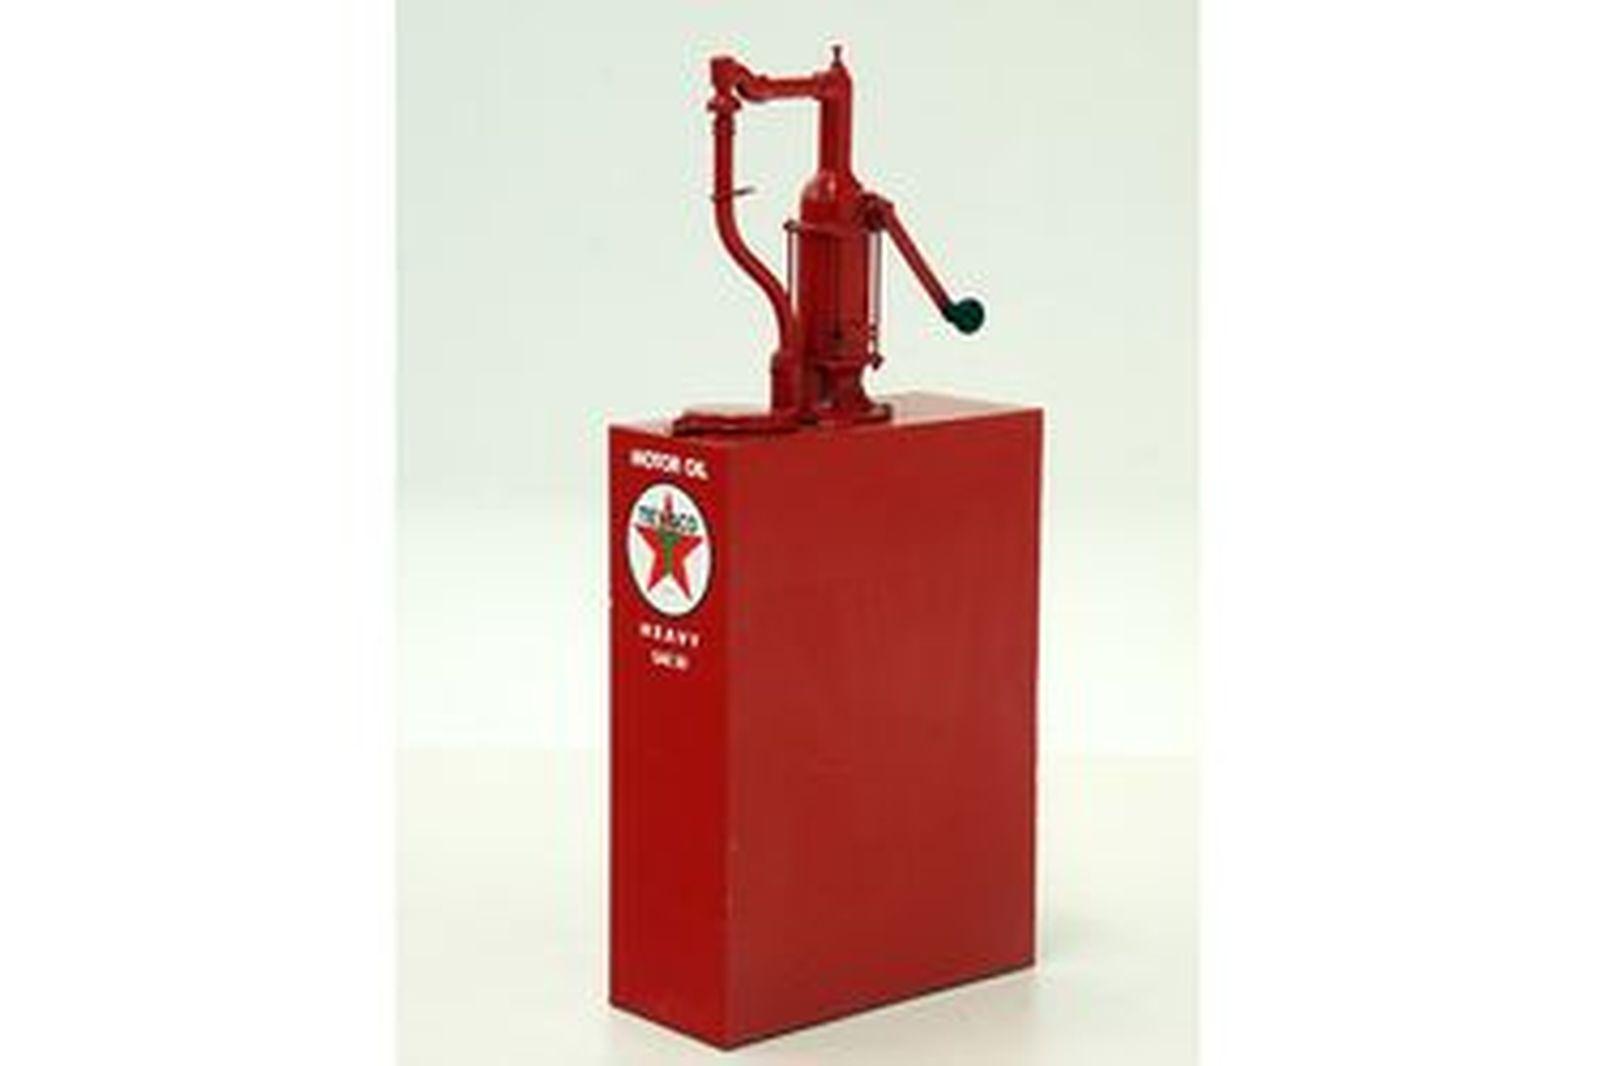 Hi-Boy - Early Rotary Pump Type Restored in Texaco Livery